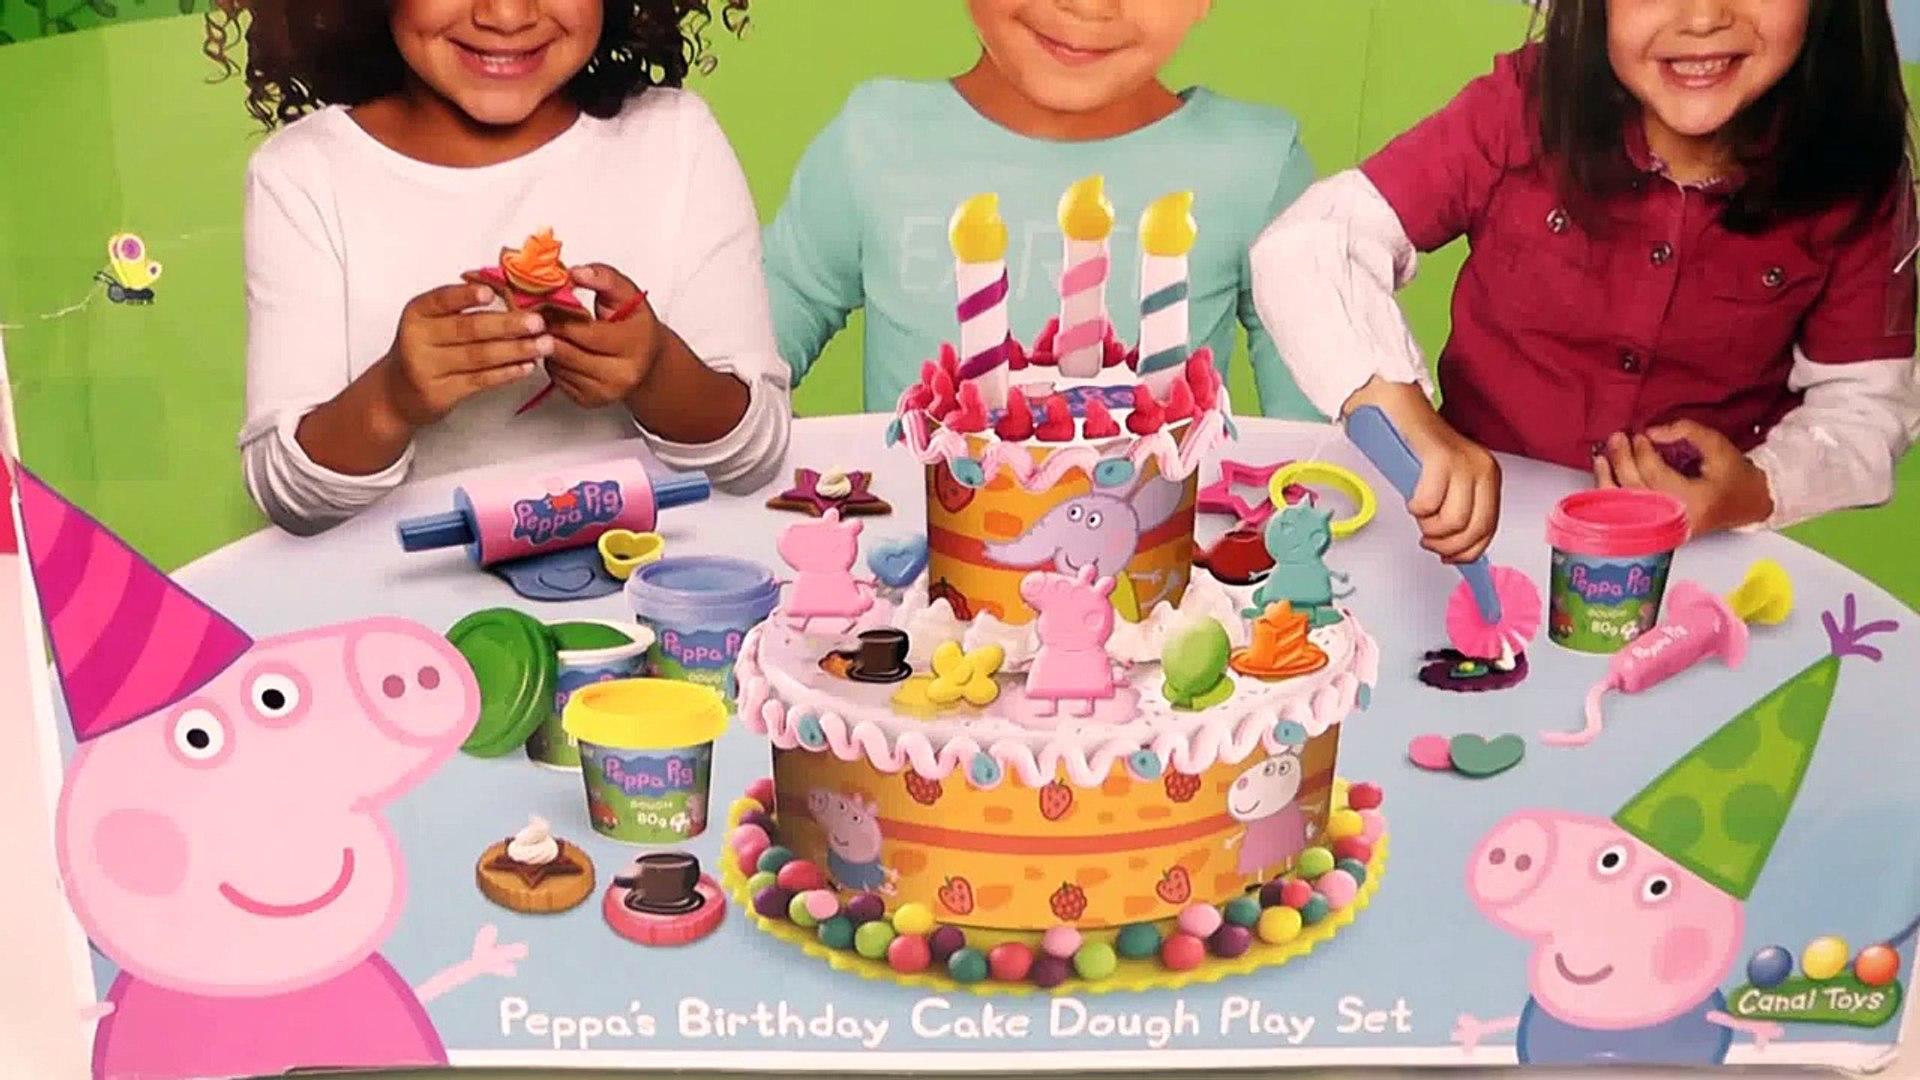 Play Doh Peppa Pig Birthday Cake Dough Set Torta De Cumpleanos Bolo De Aniversario Plastilin New Video Dailymotion